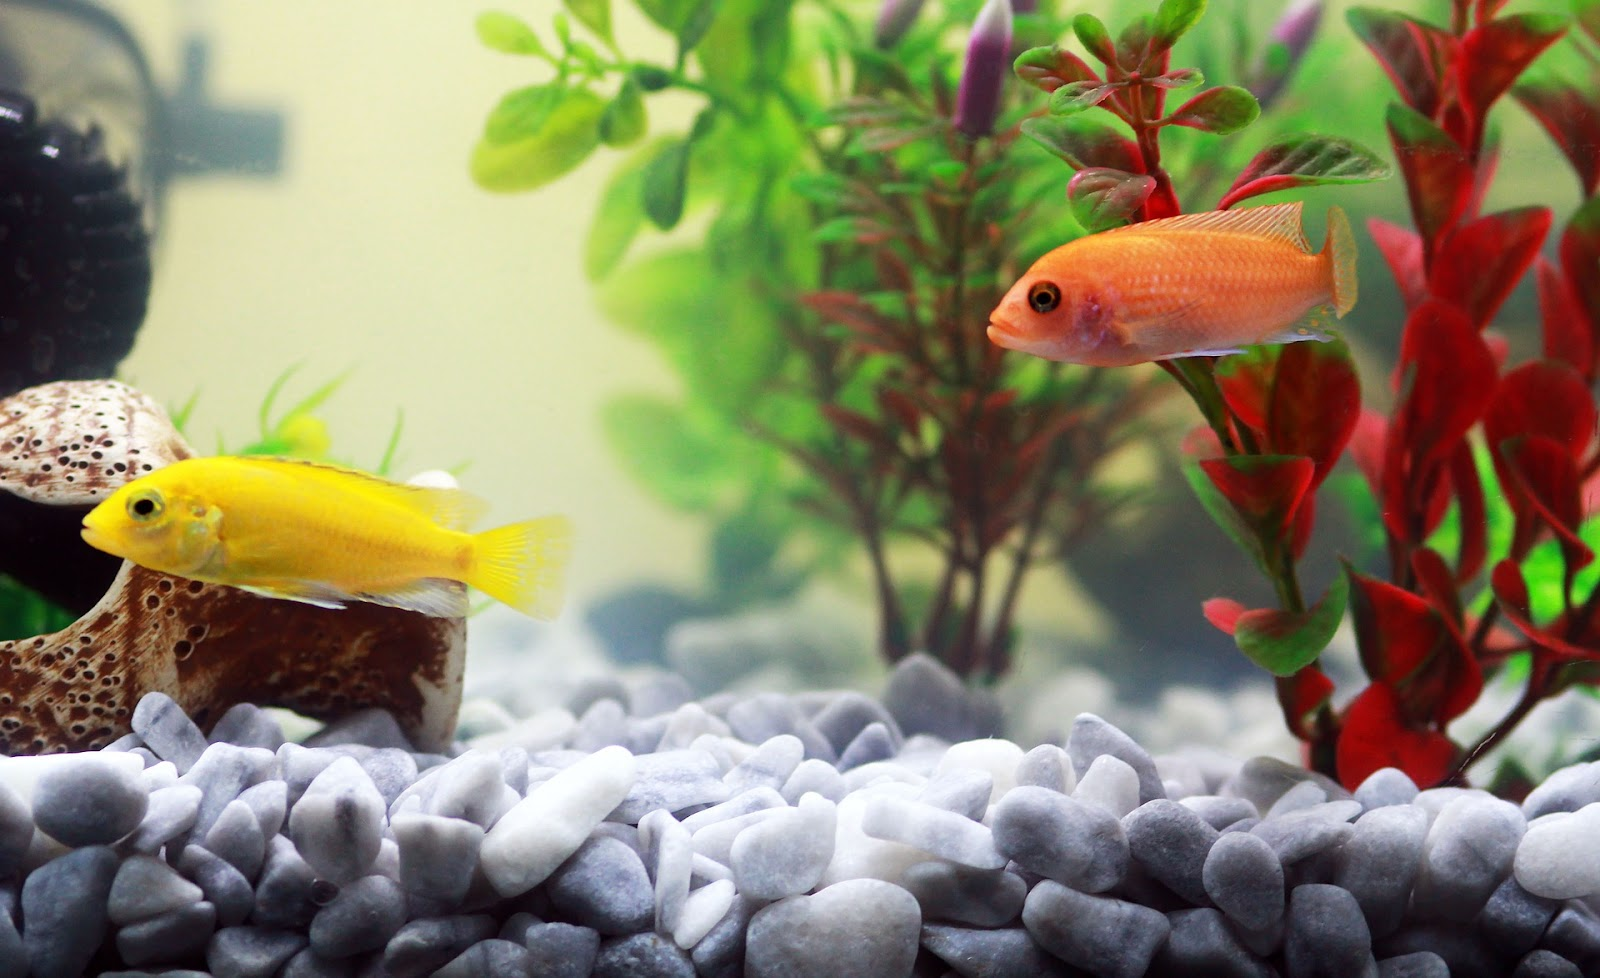 Aquarium with plants and fish